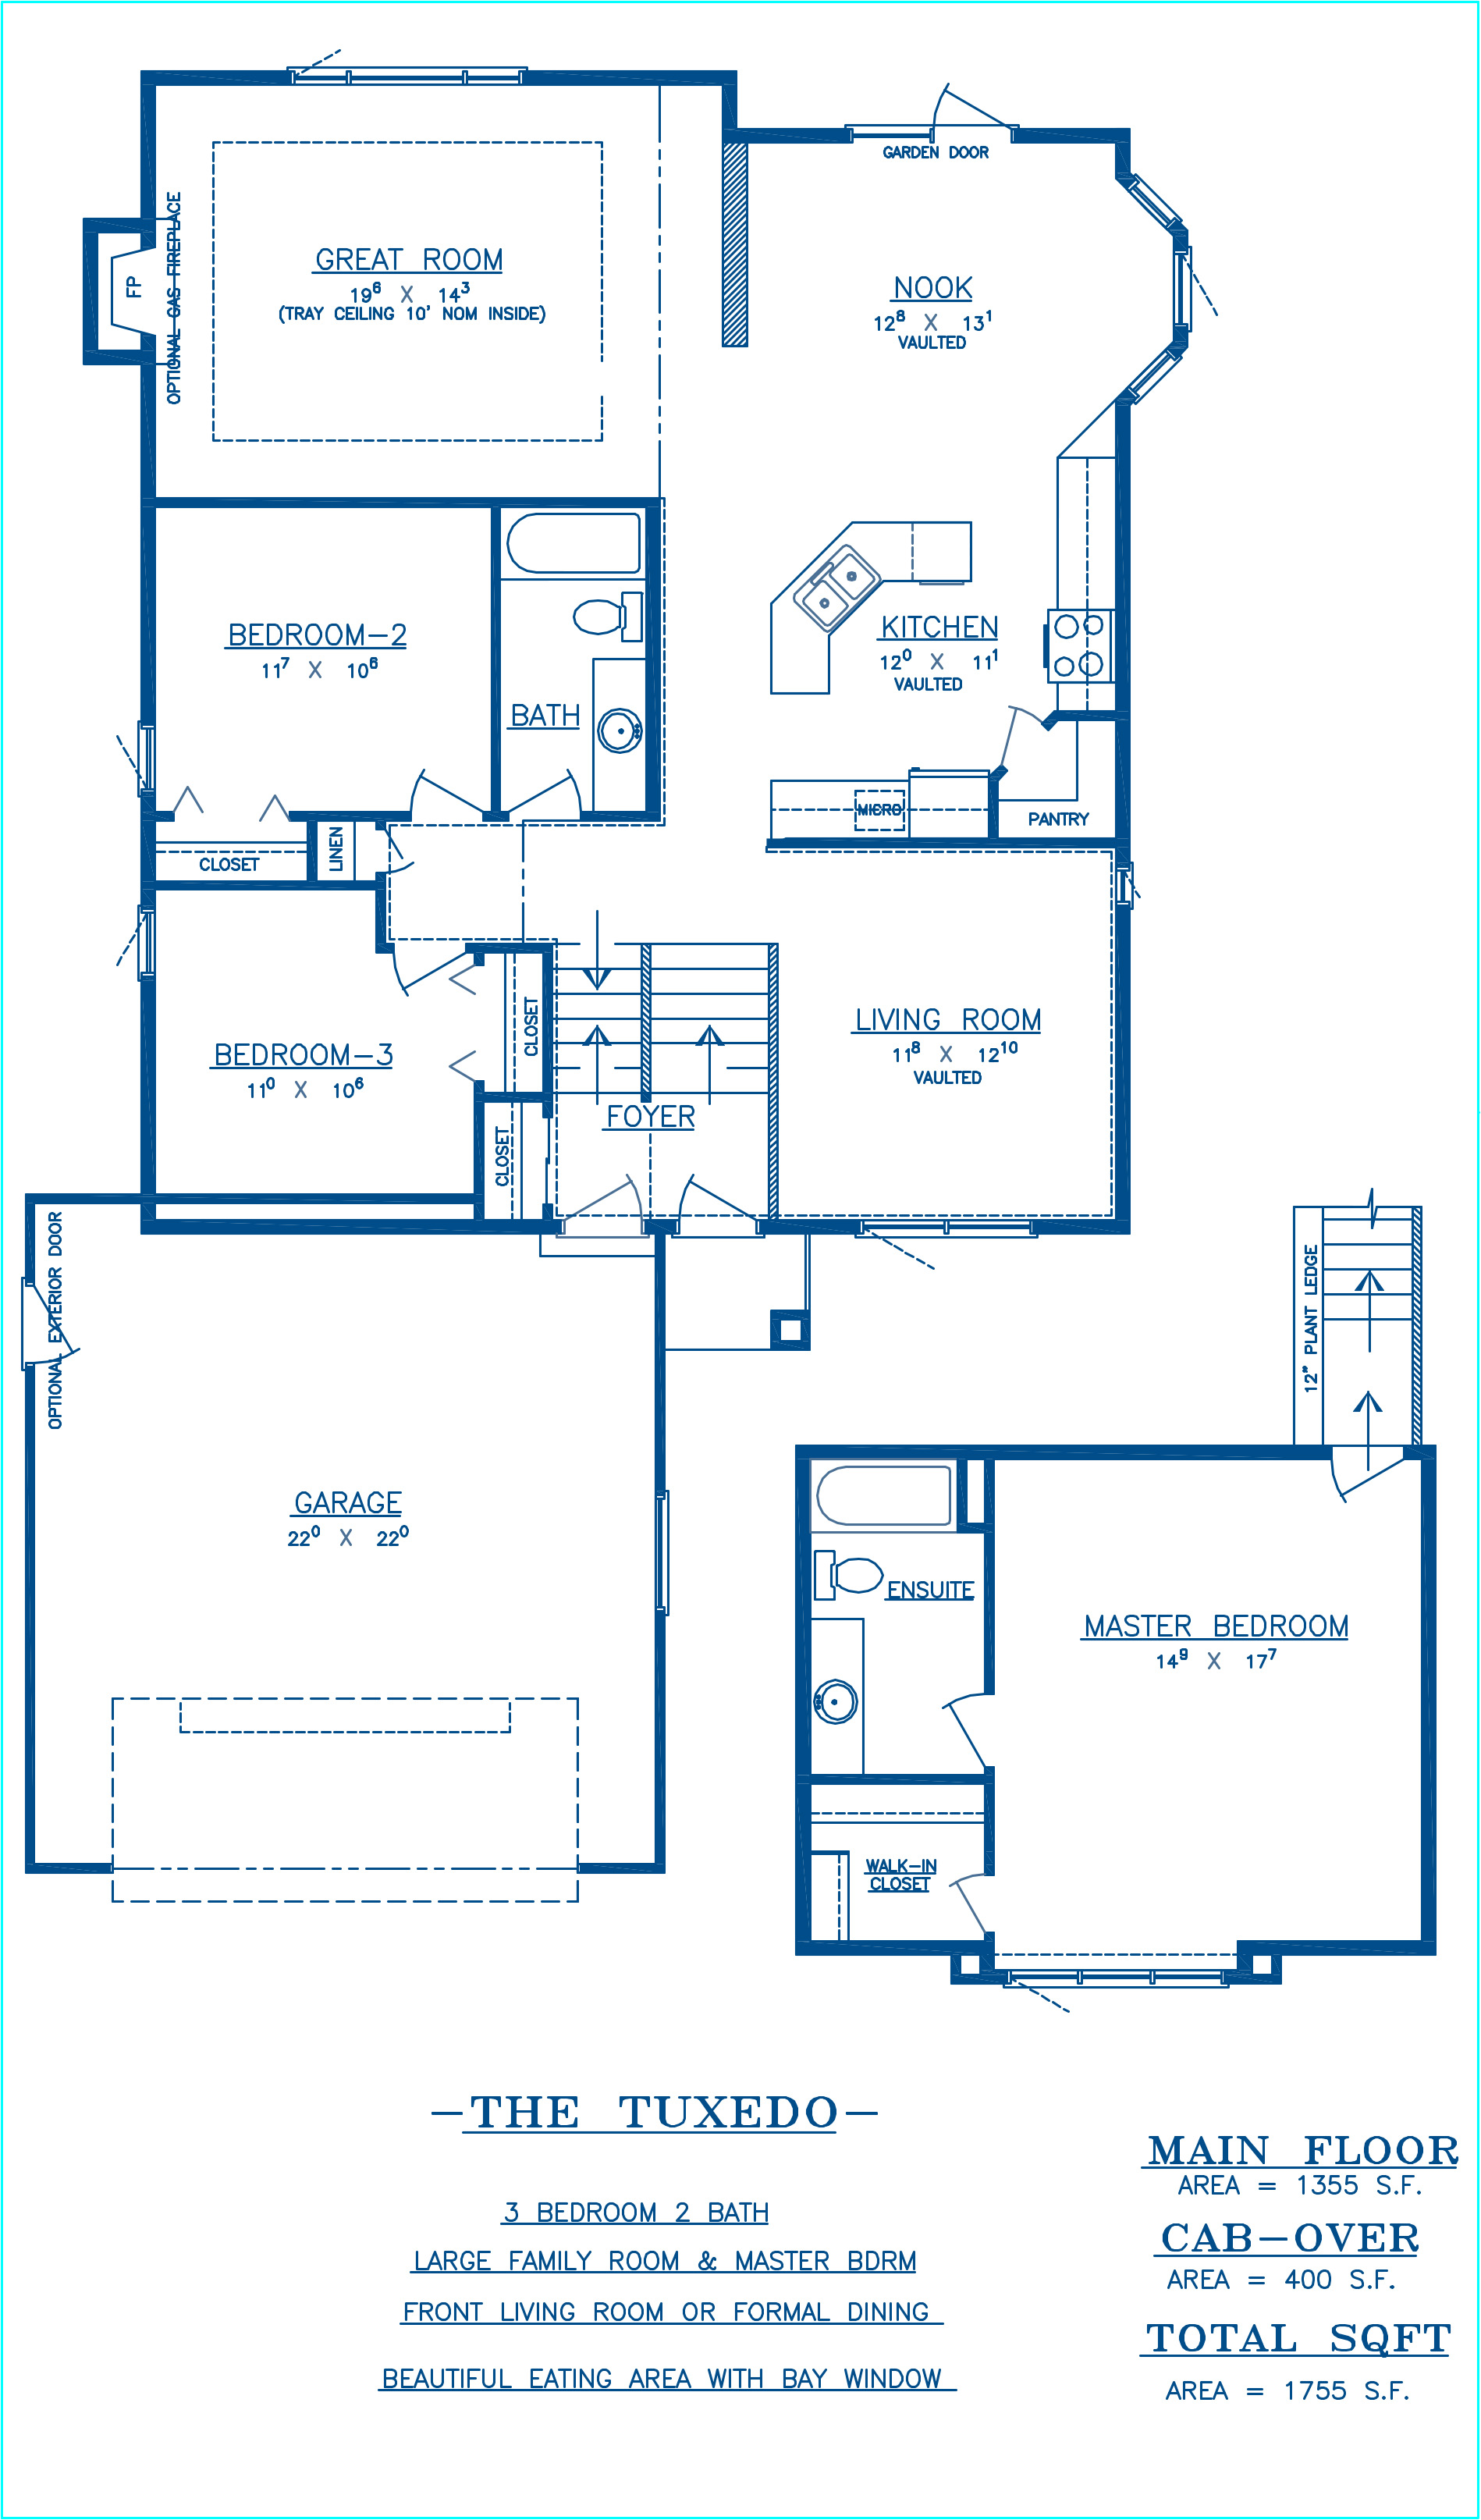 Tuxedo - Floor Plan